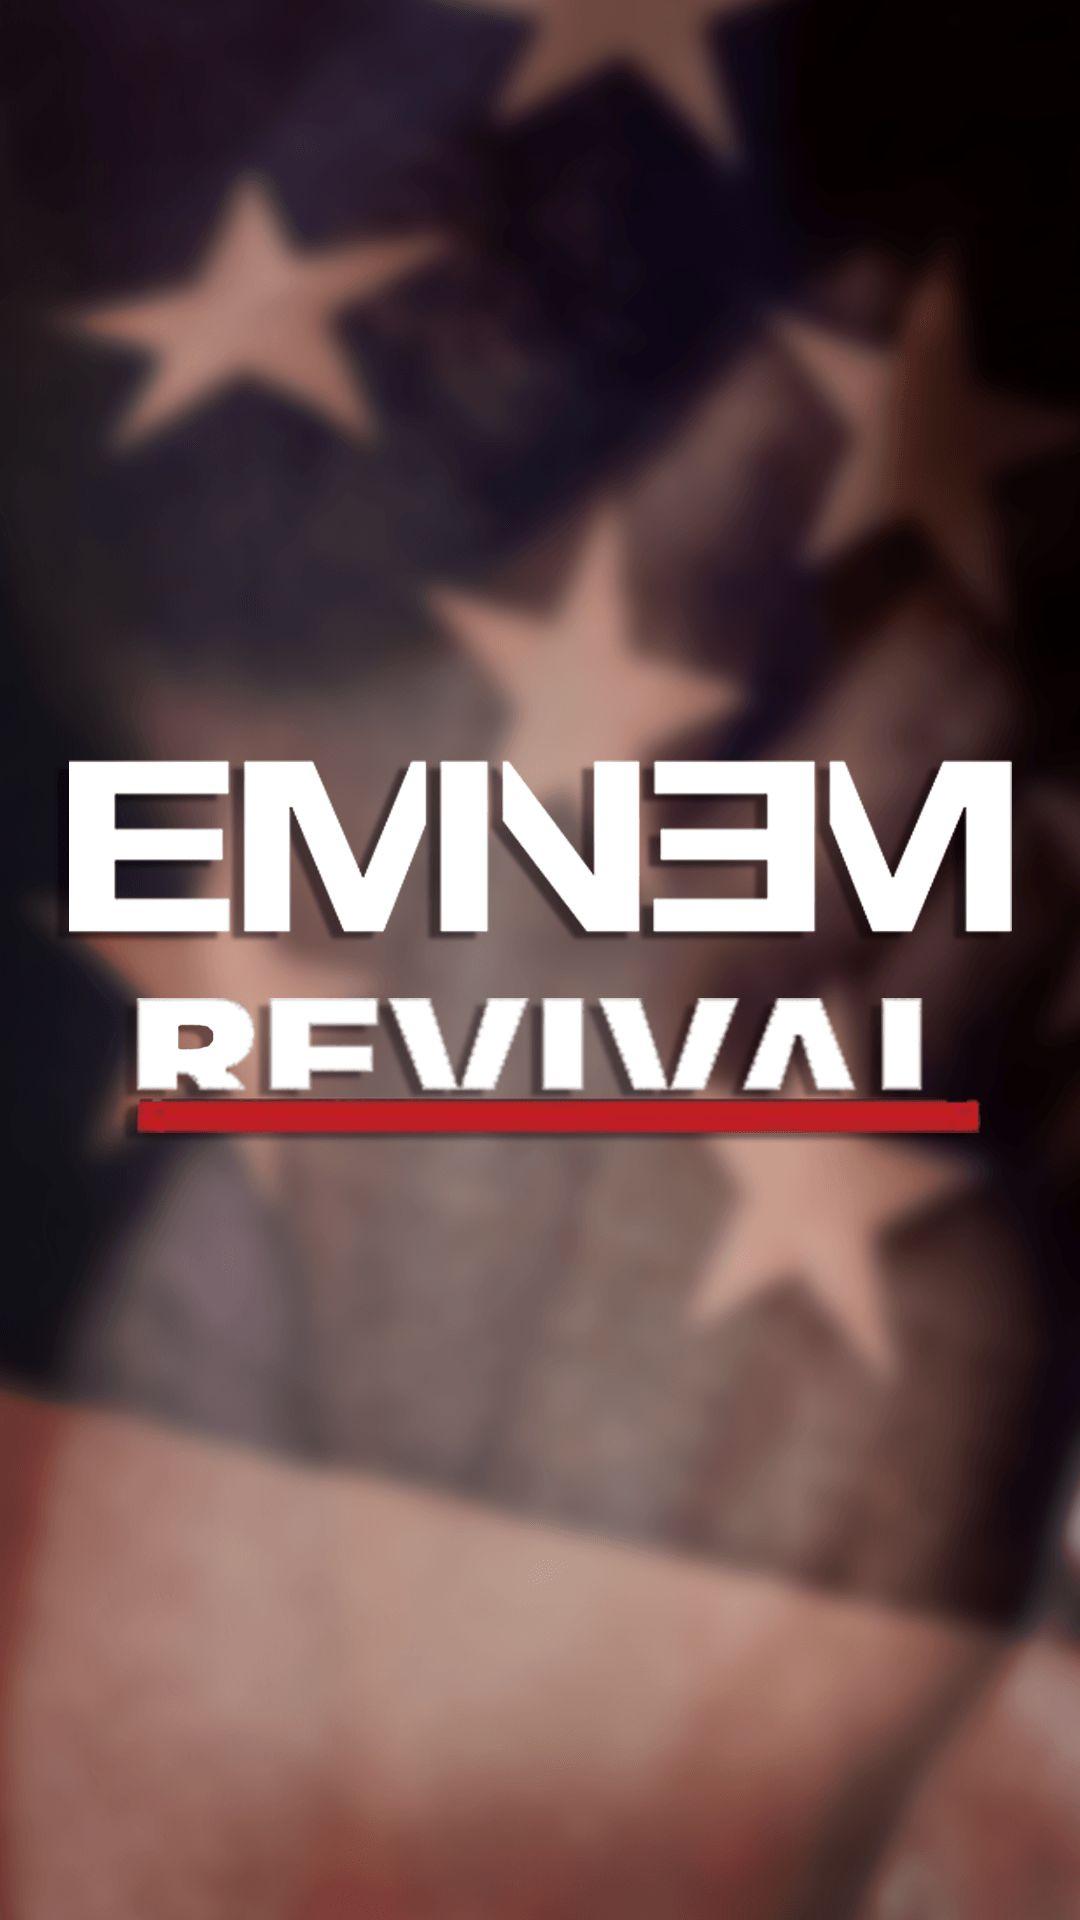 Eminem iPhone x wallpaper hd